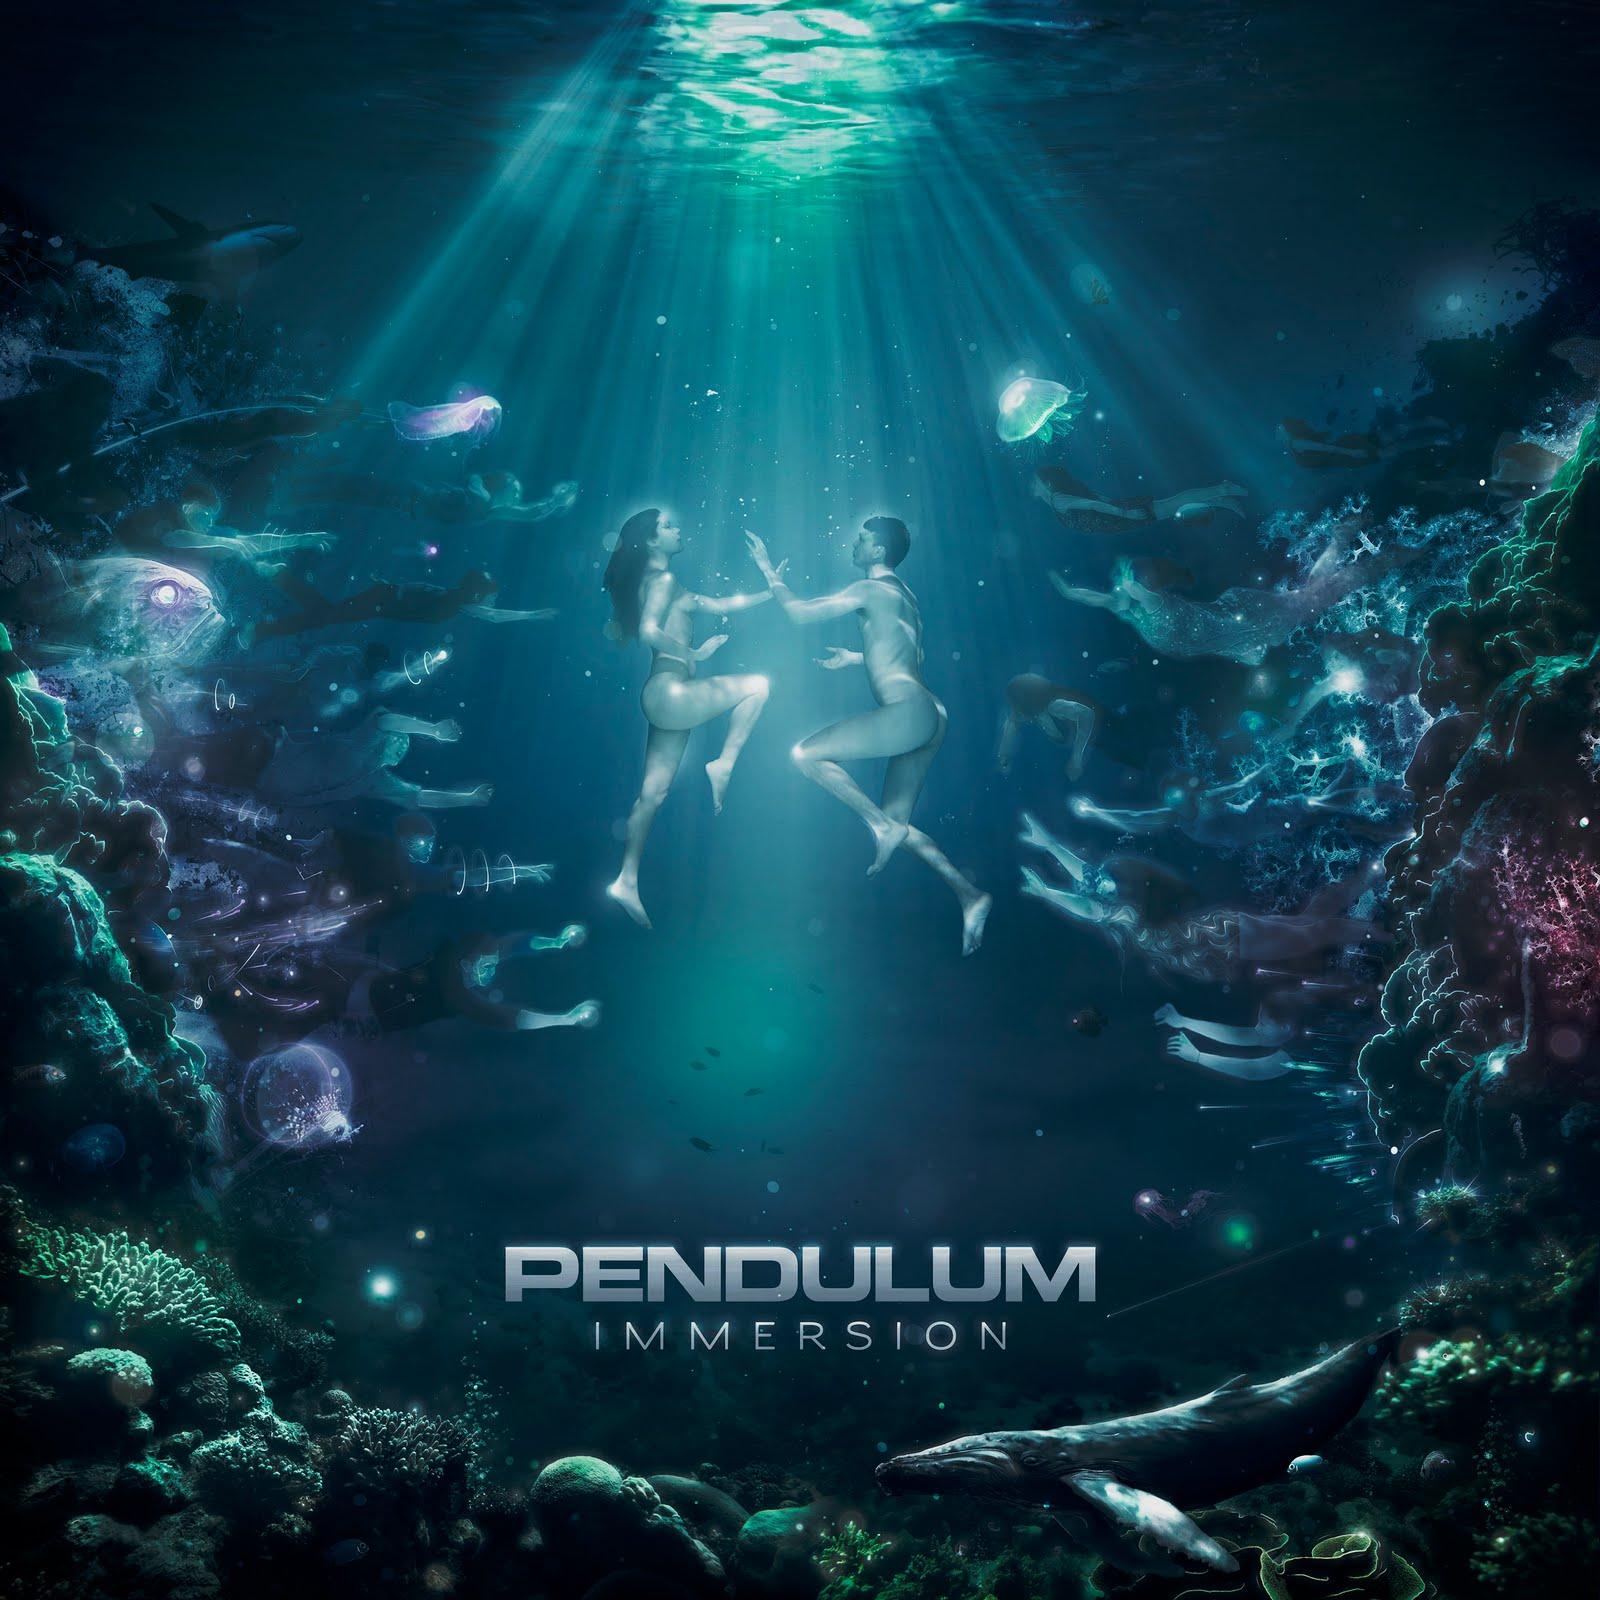 Under the Covers 4 - Página 17 Pendulum-immersion-valp-6